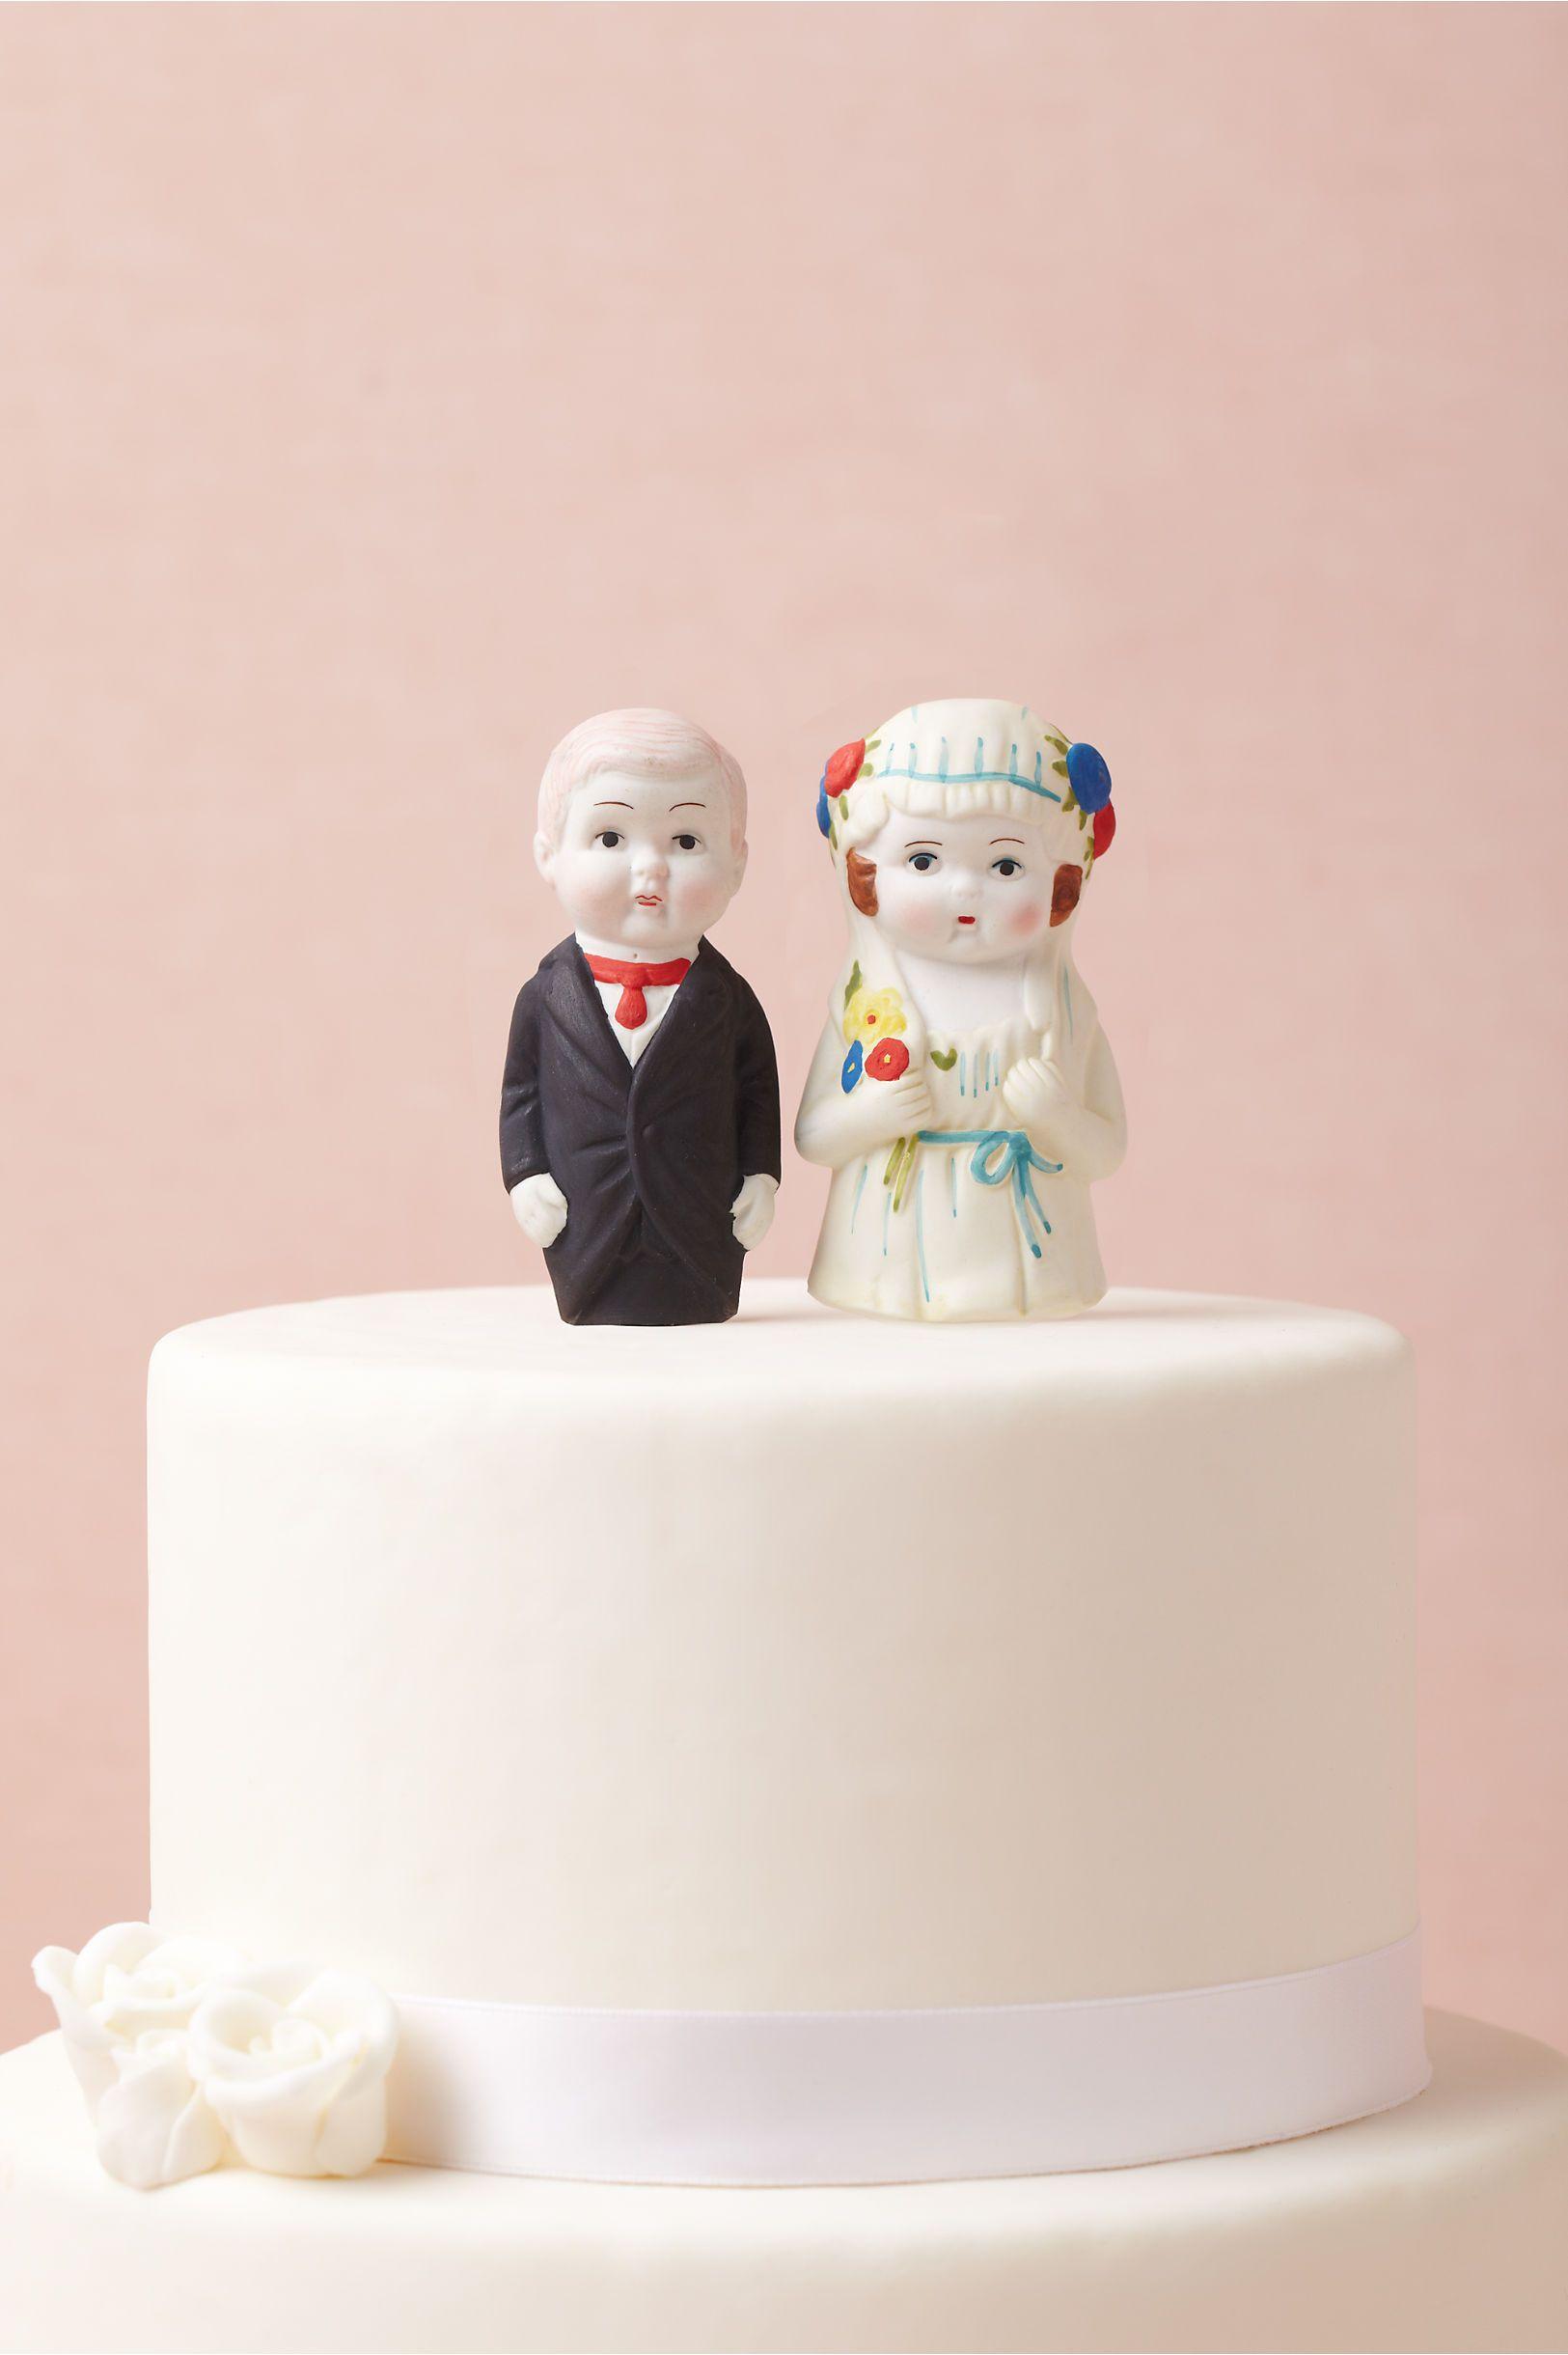 Newlyweds Cake Topper in SHOP Sale at BHLDN | Sweet Weddings ...